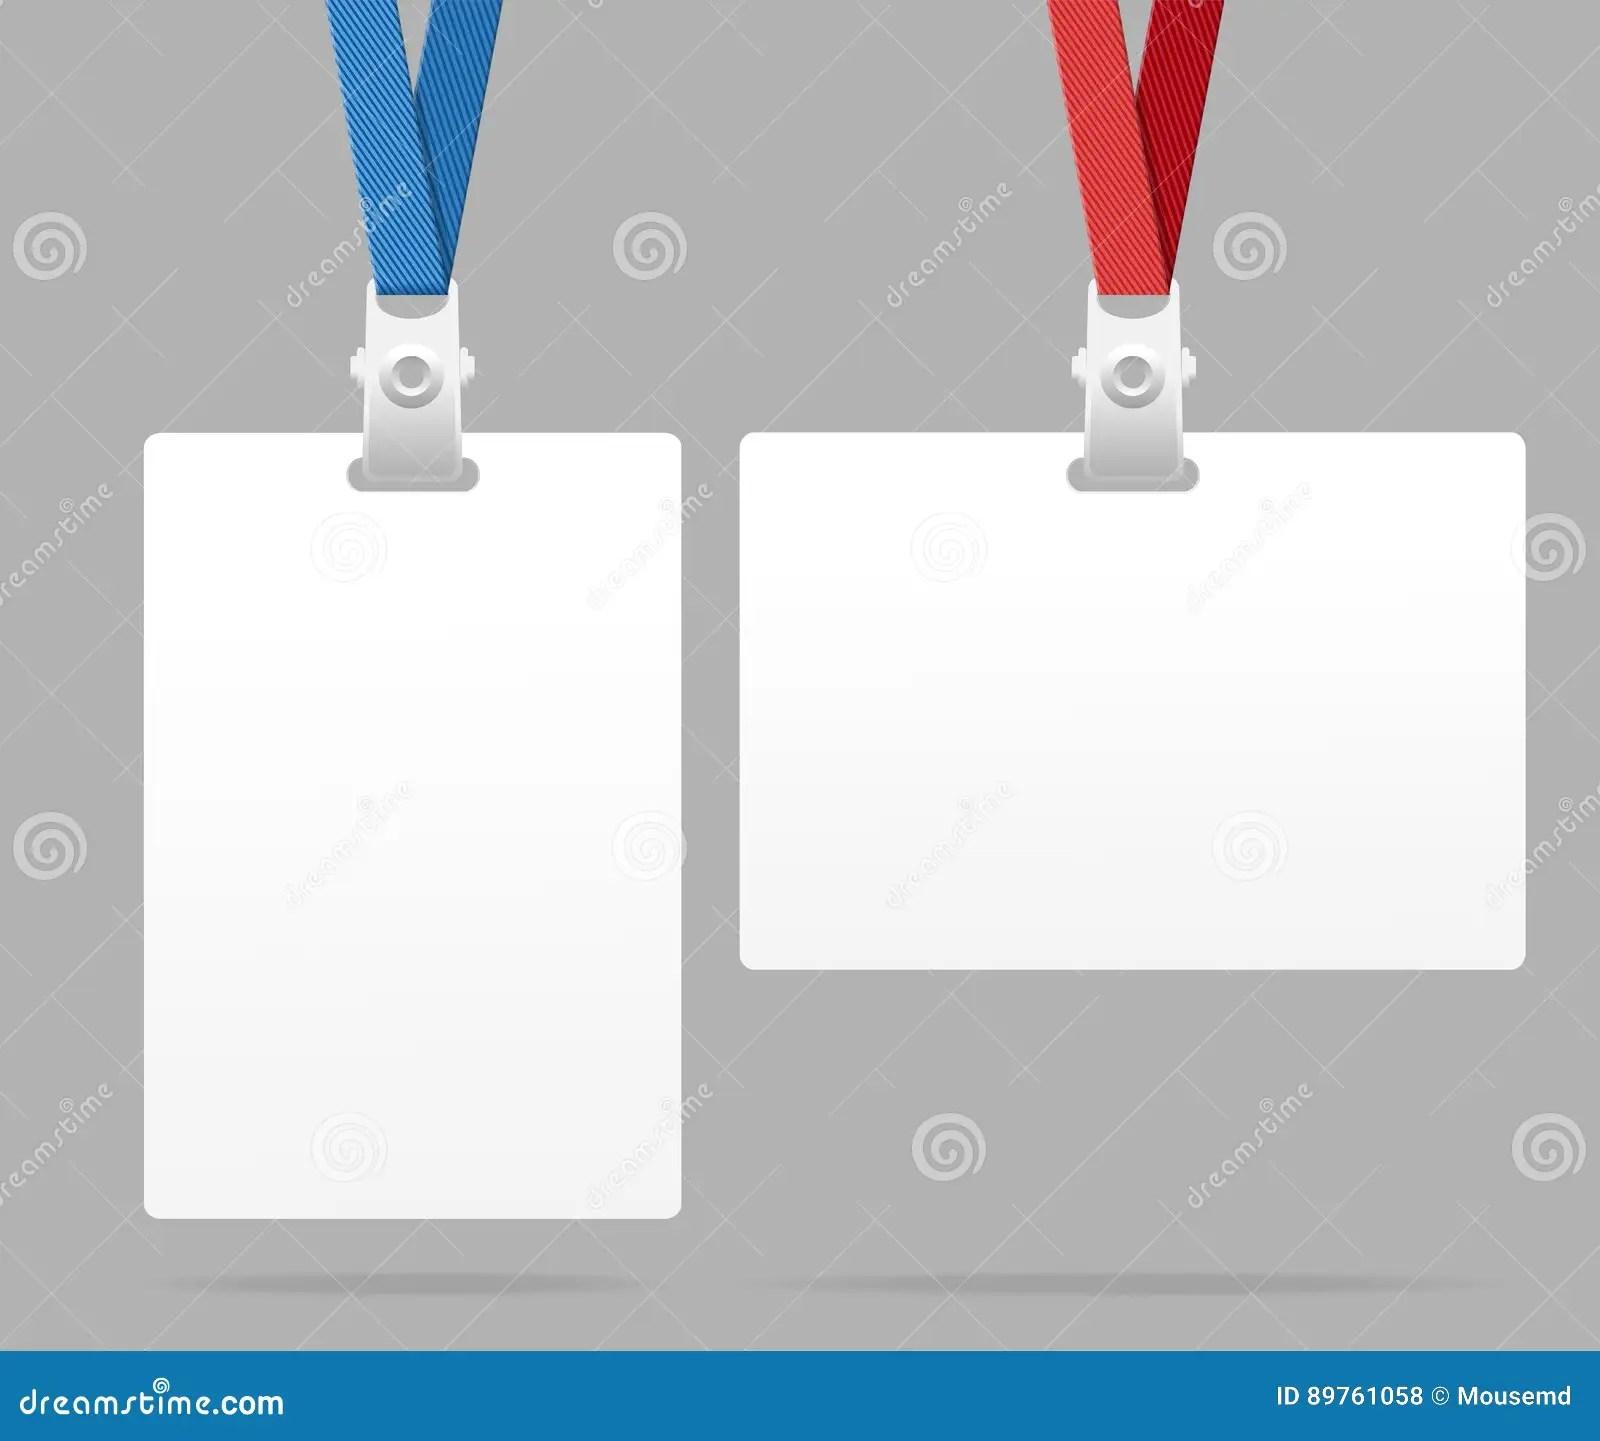 Fazer download do arquivo curta nossa página no facebook. Id Card Template Plastic Badge Vector Stock Vector Illustration Of Element Identity 89761058